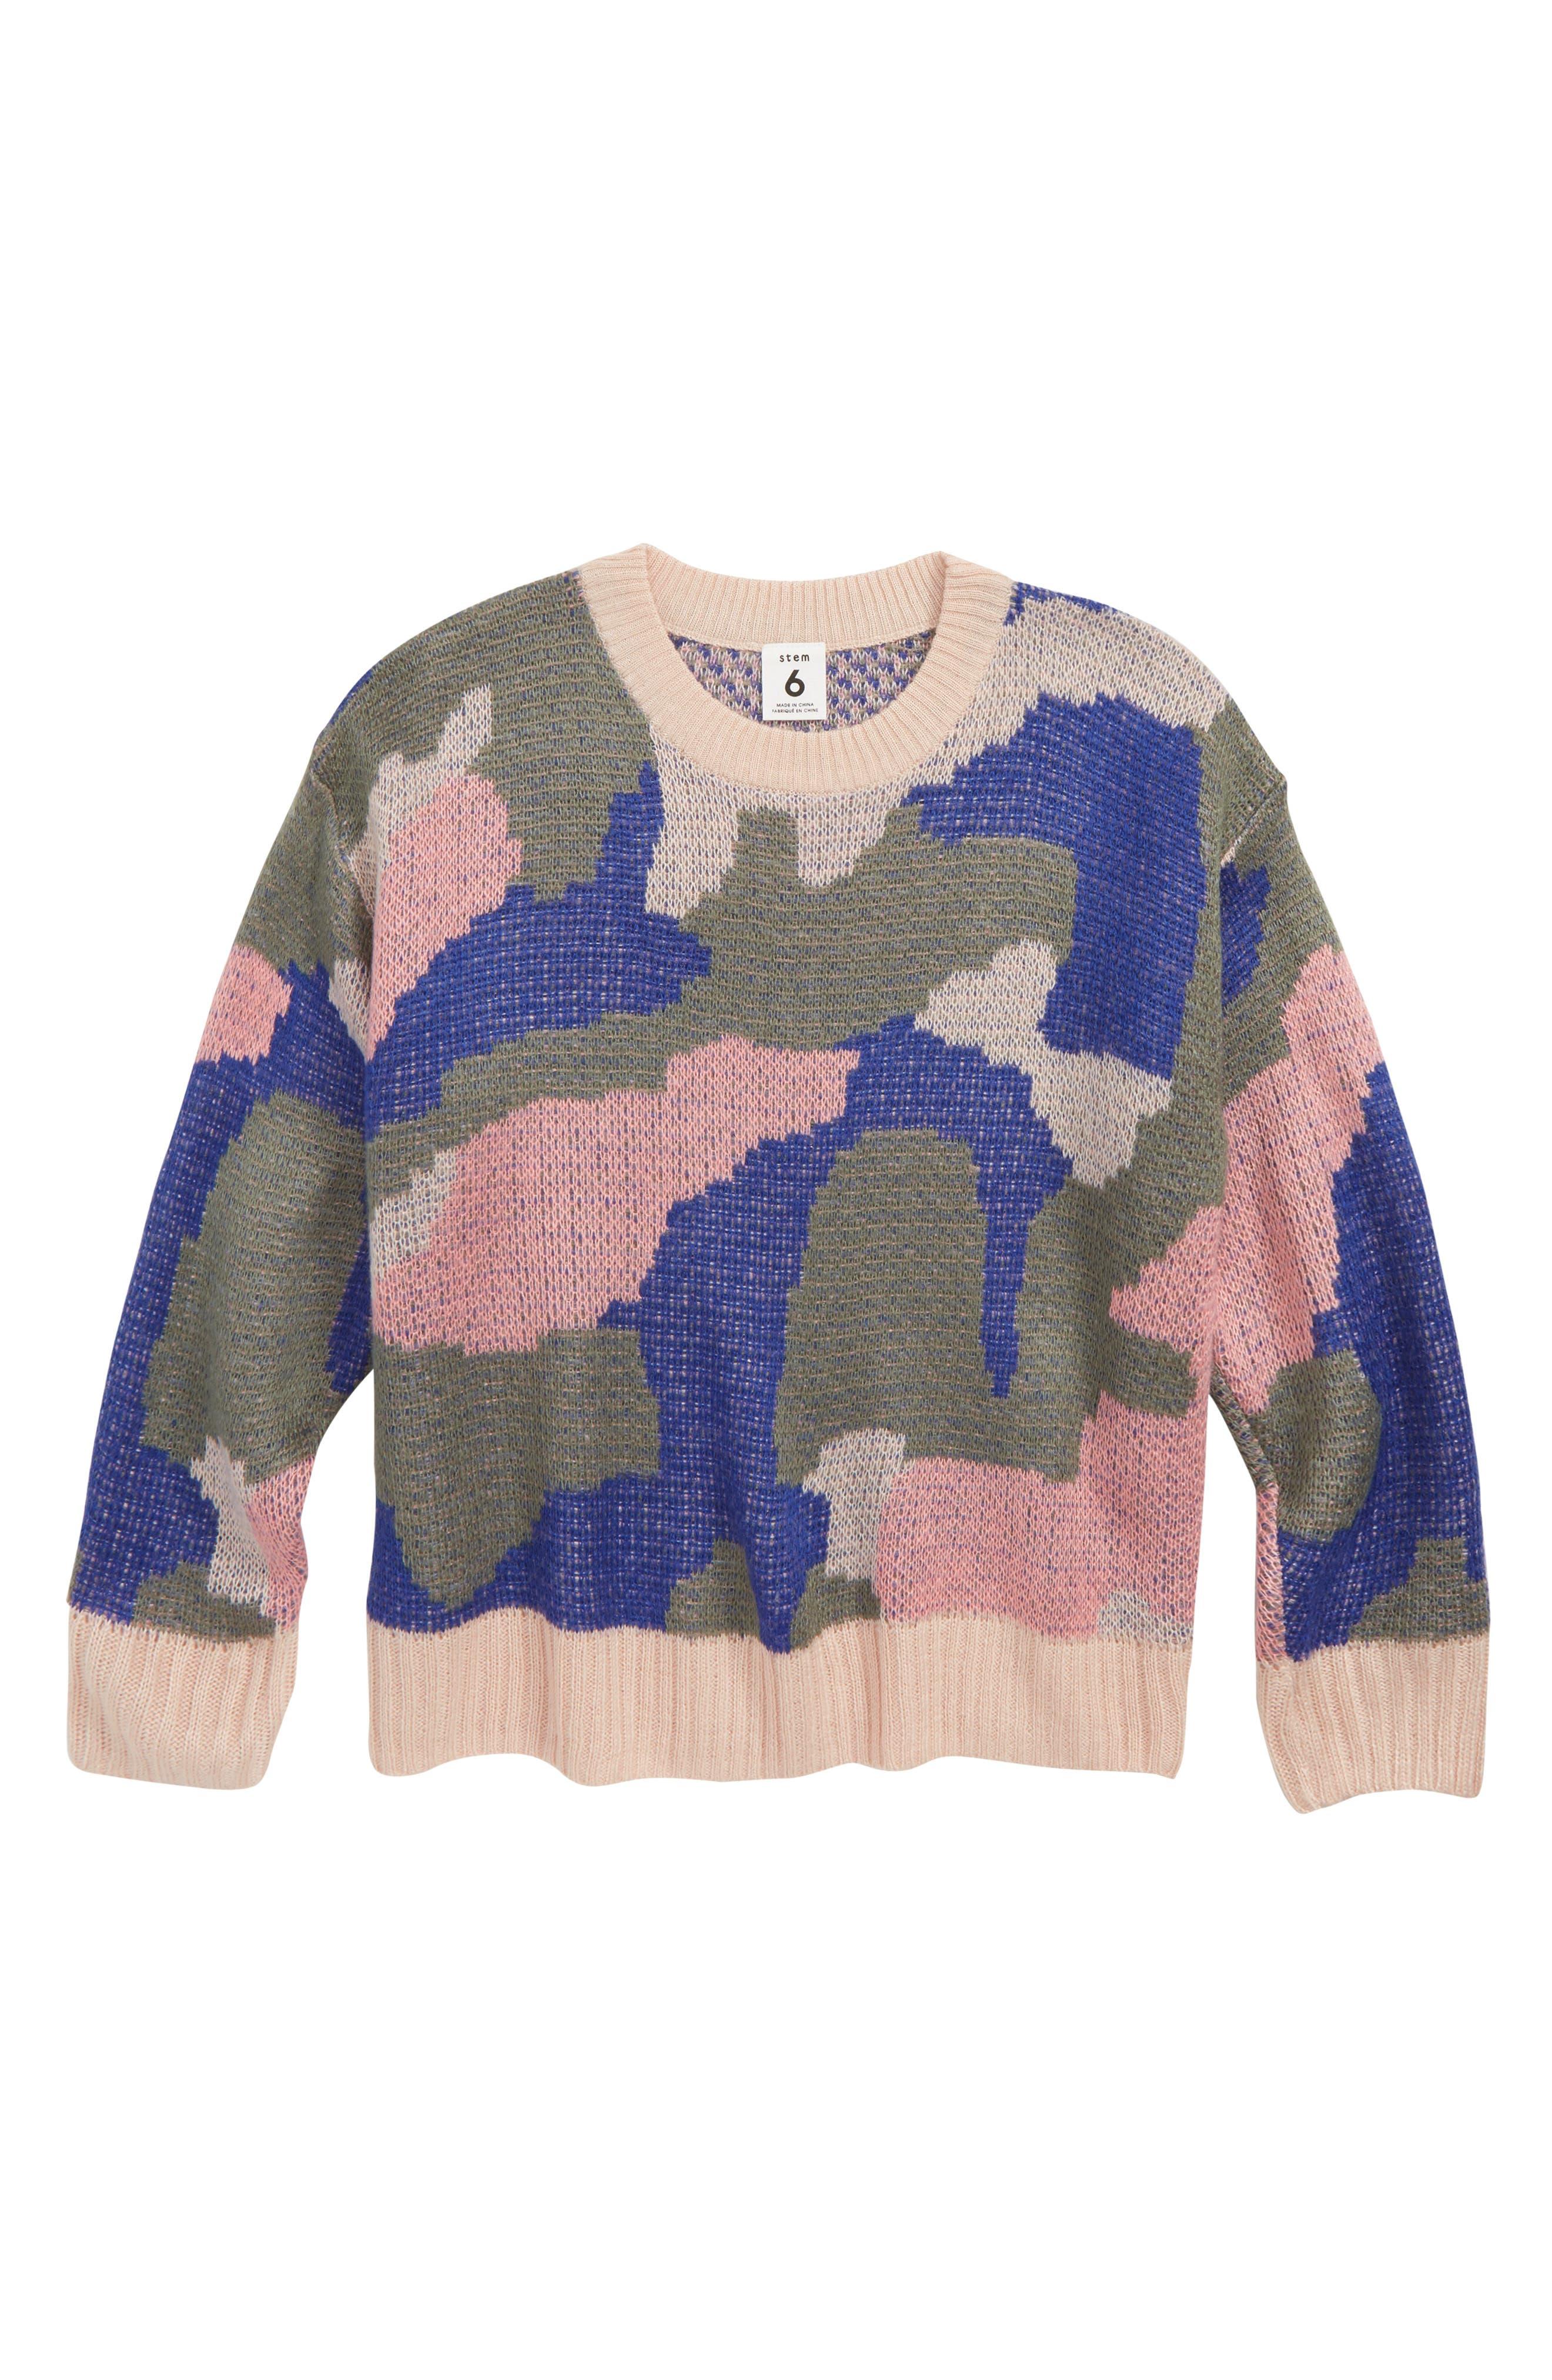 Abstract Sweater,                             Main thumbnail 1, color,                             PINK SMOKE CAMO